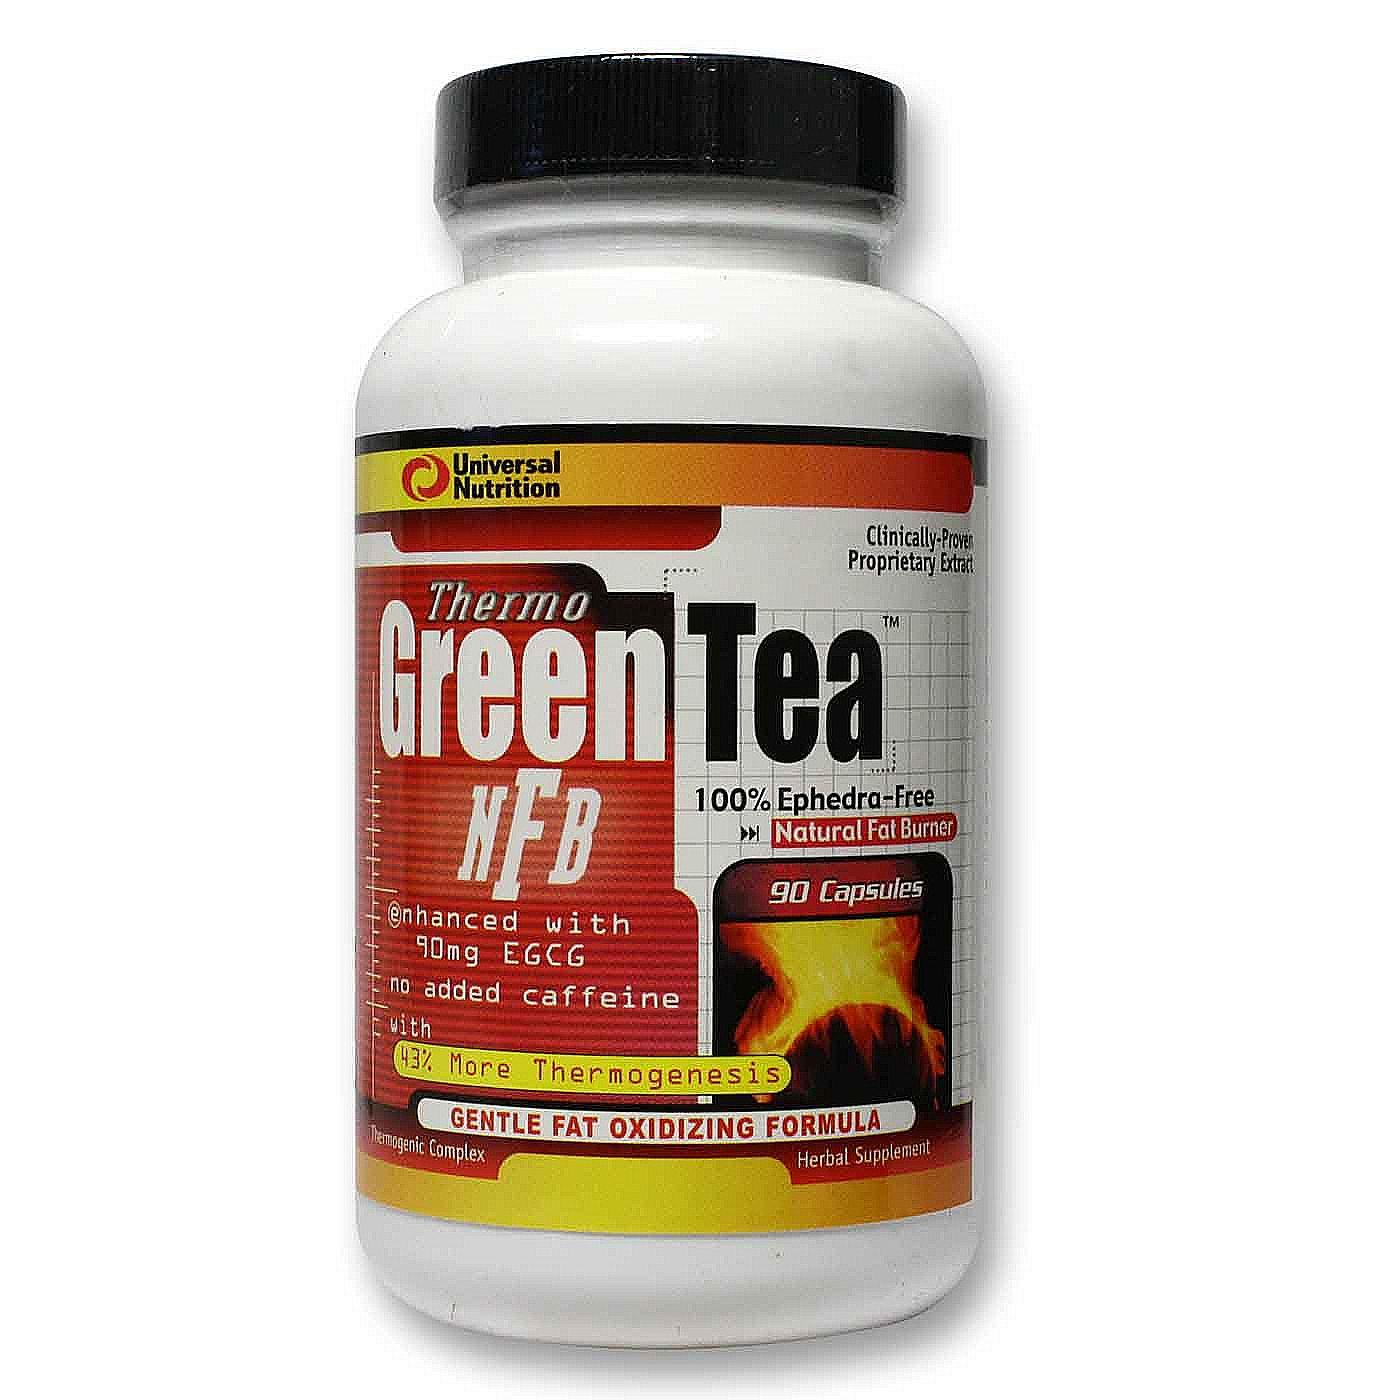 Thermo green tea